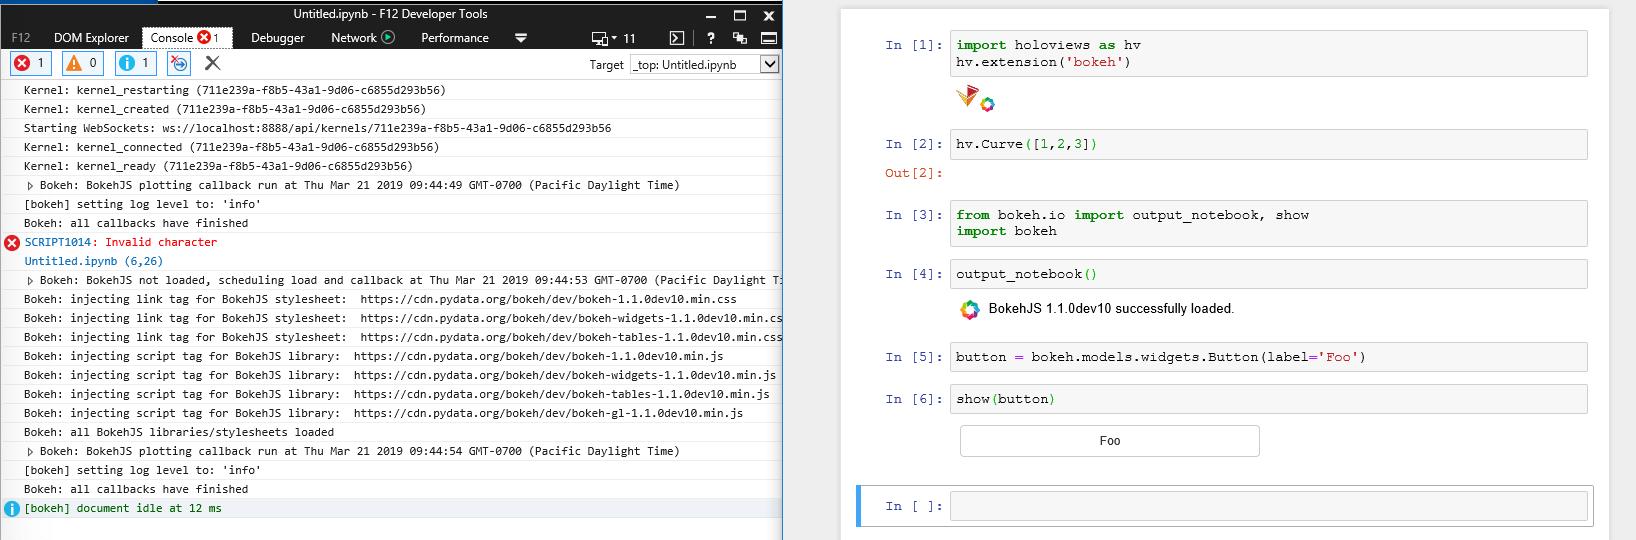 Windows does not display widget · Issue #321 · pyviz/panel · GitHub